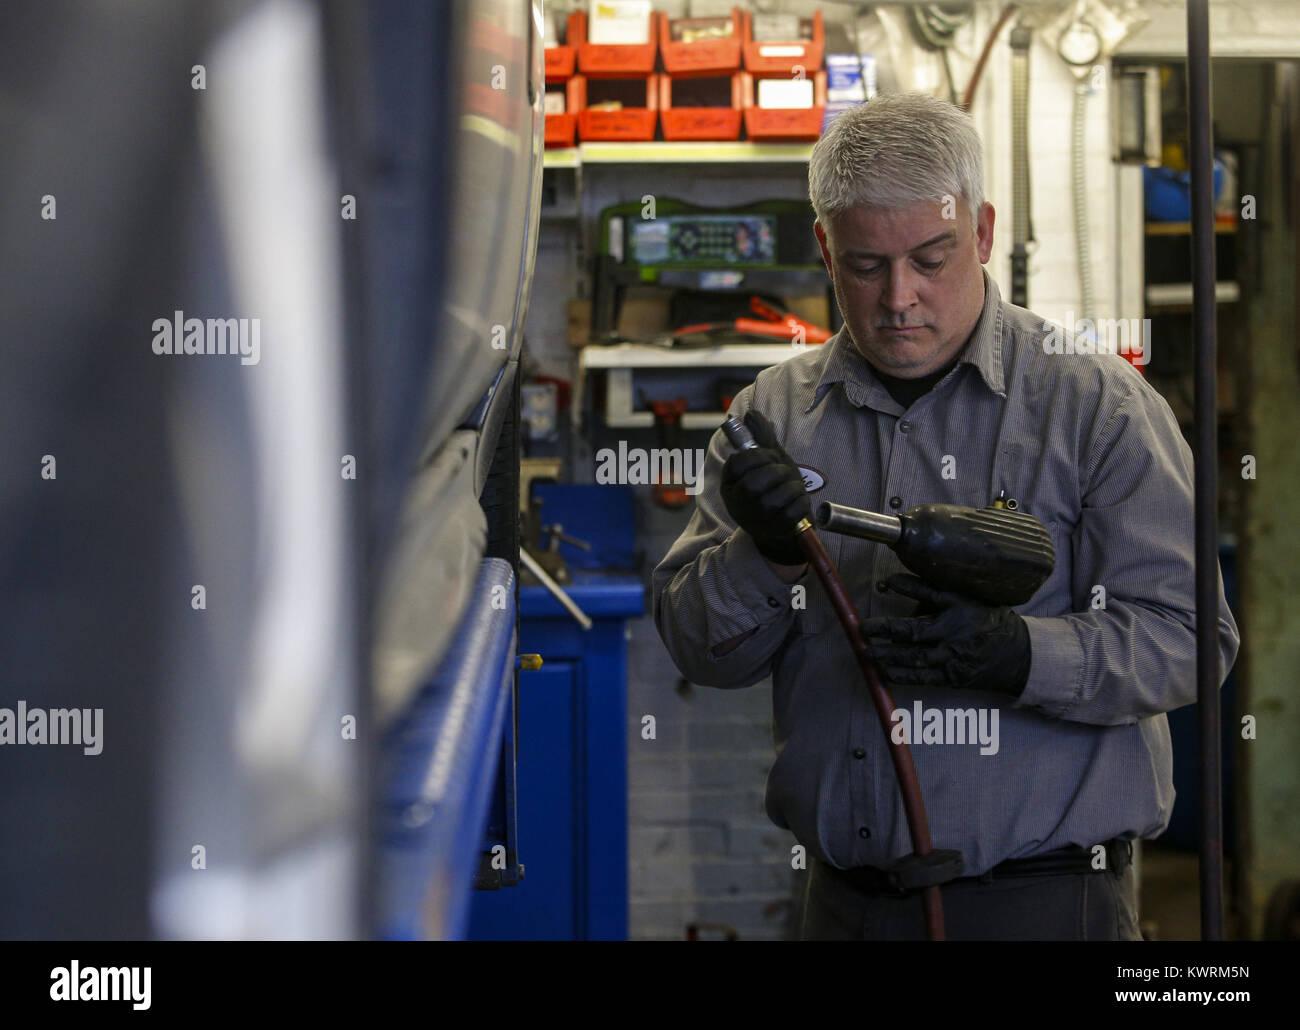 Davenport, Iowa, USA. 19th Jan, 2017. Mechanic Mike Waite breaks down his impact gun after replacing brake pads - Stock Image